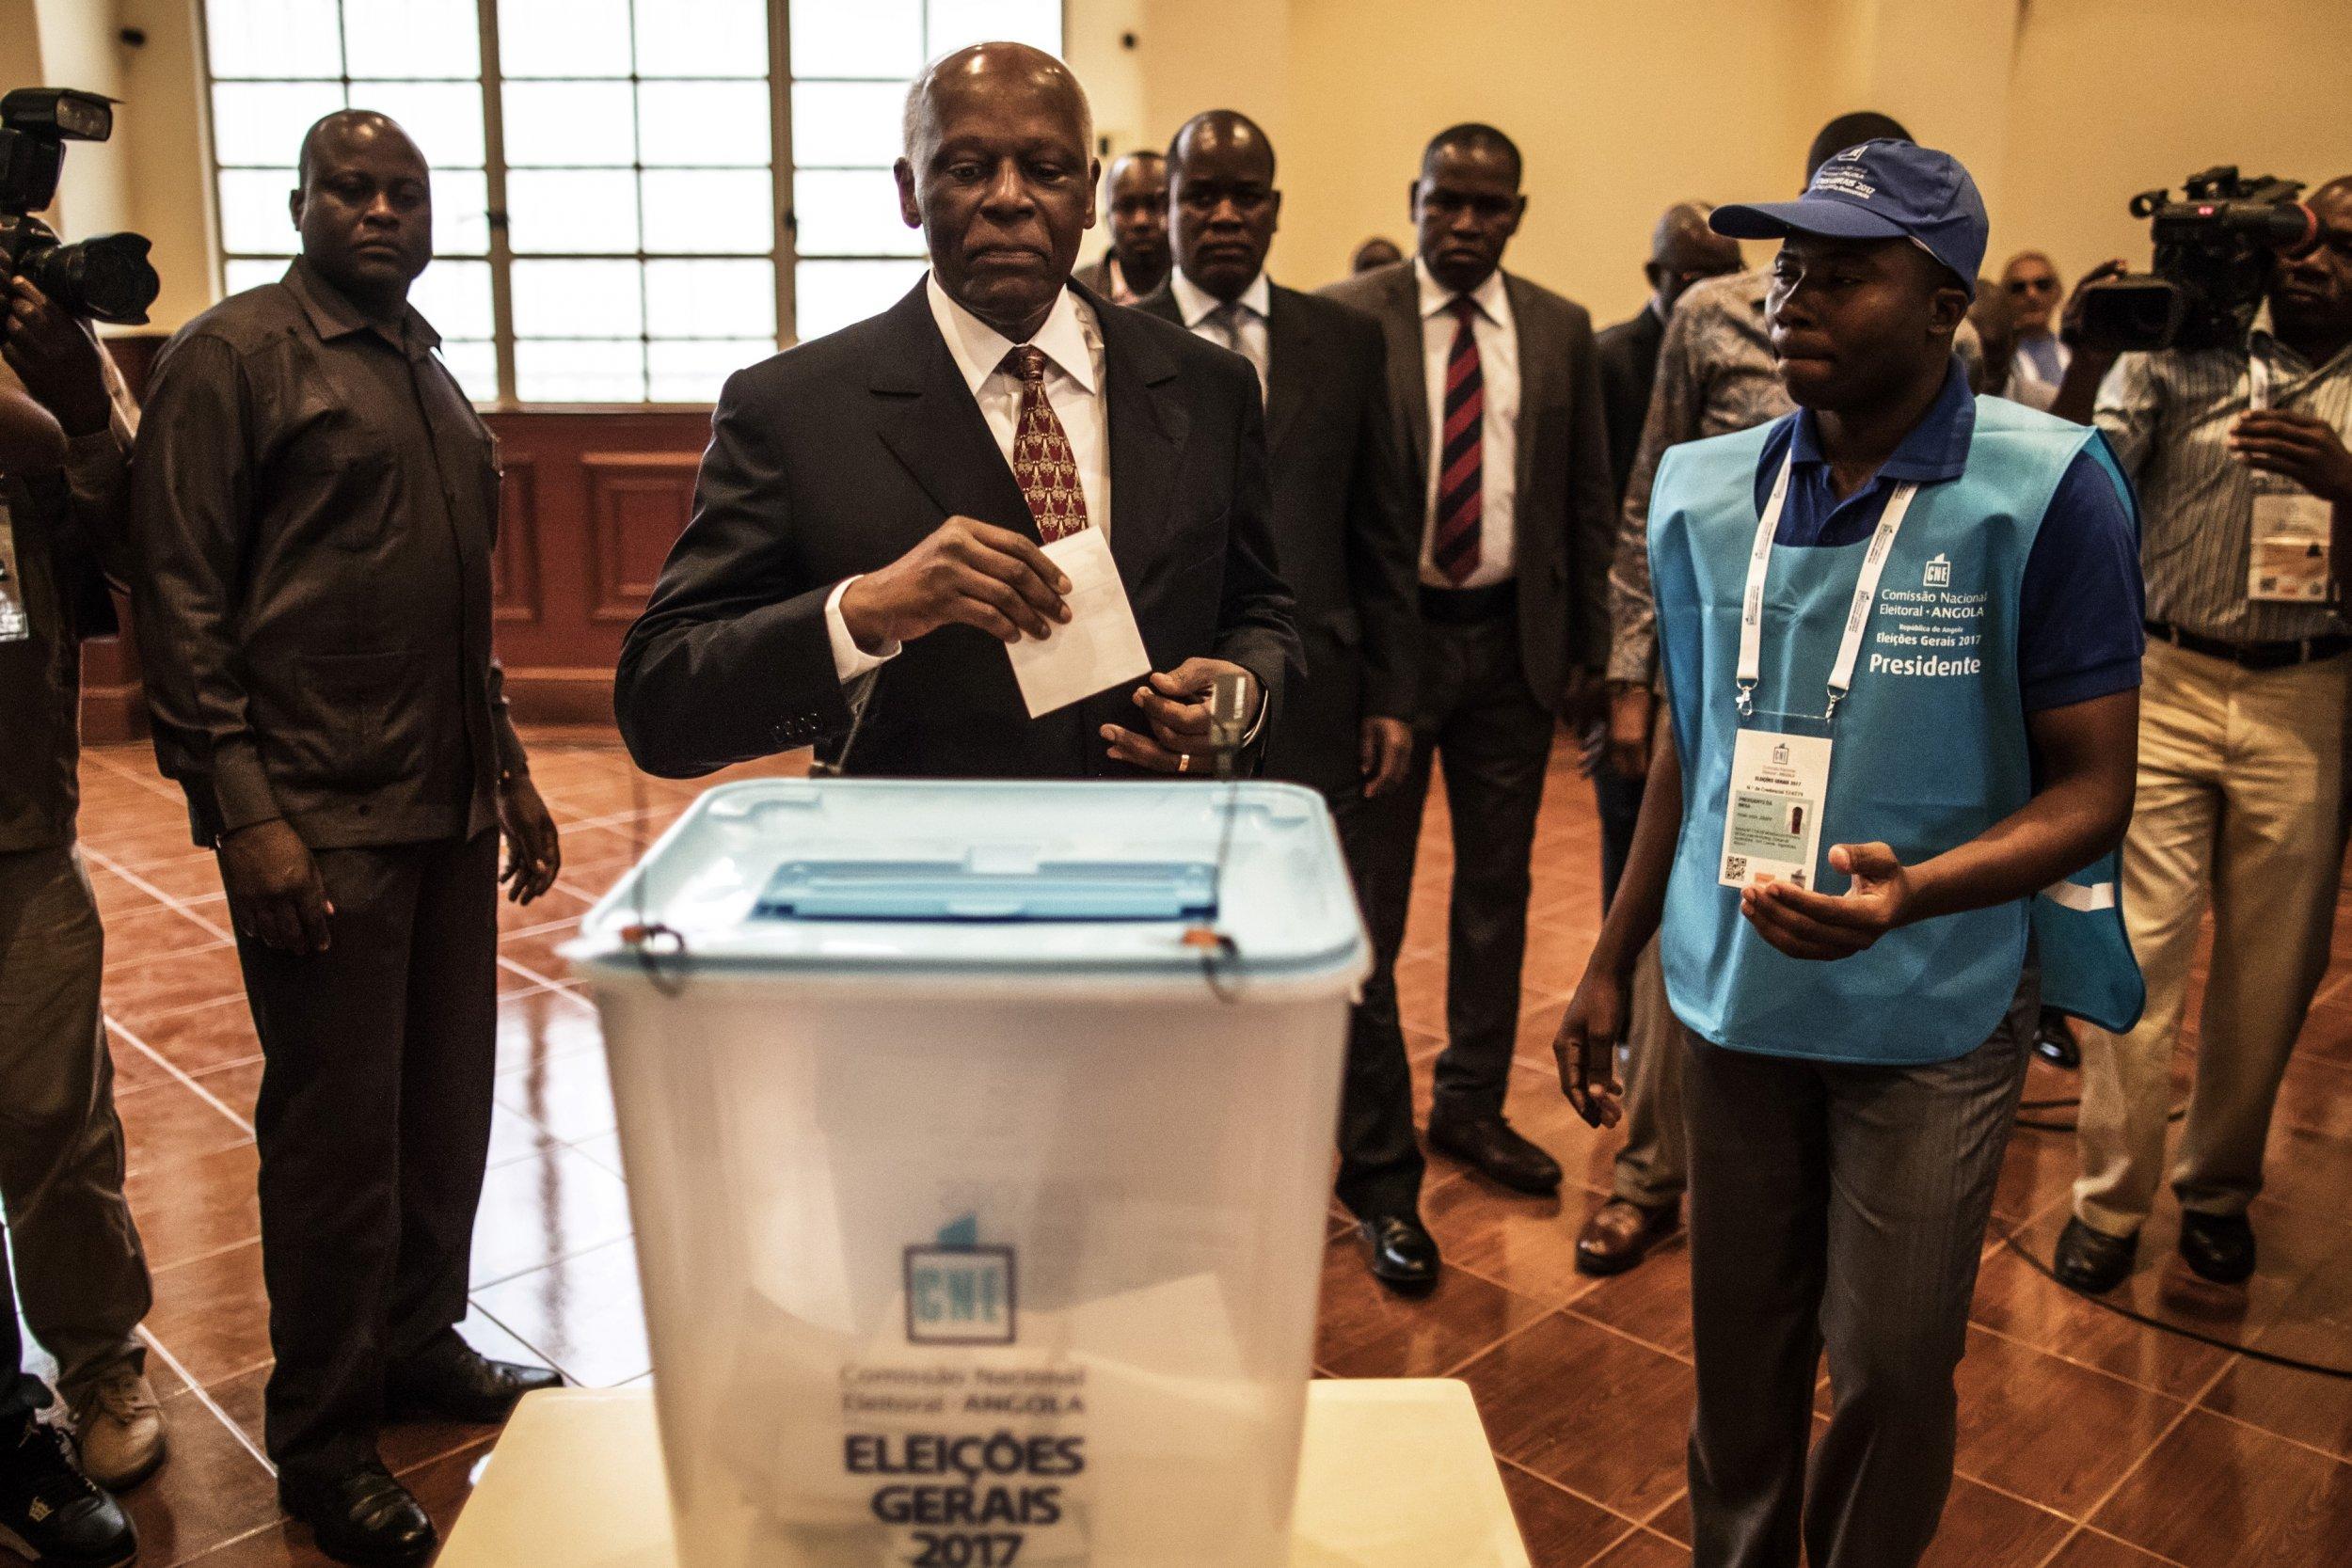 Angola president voting